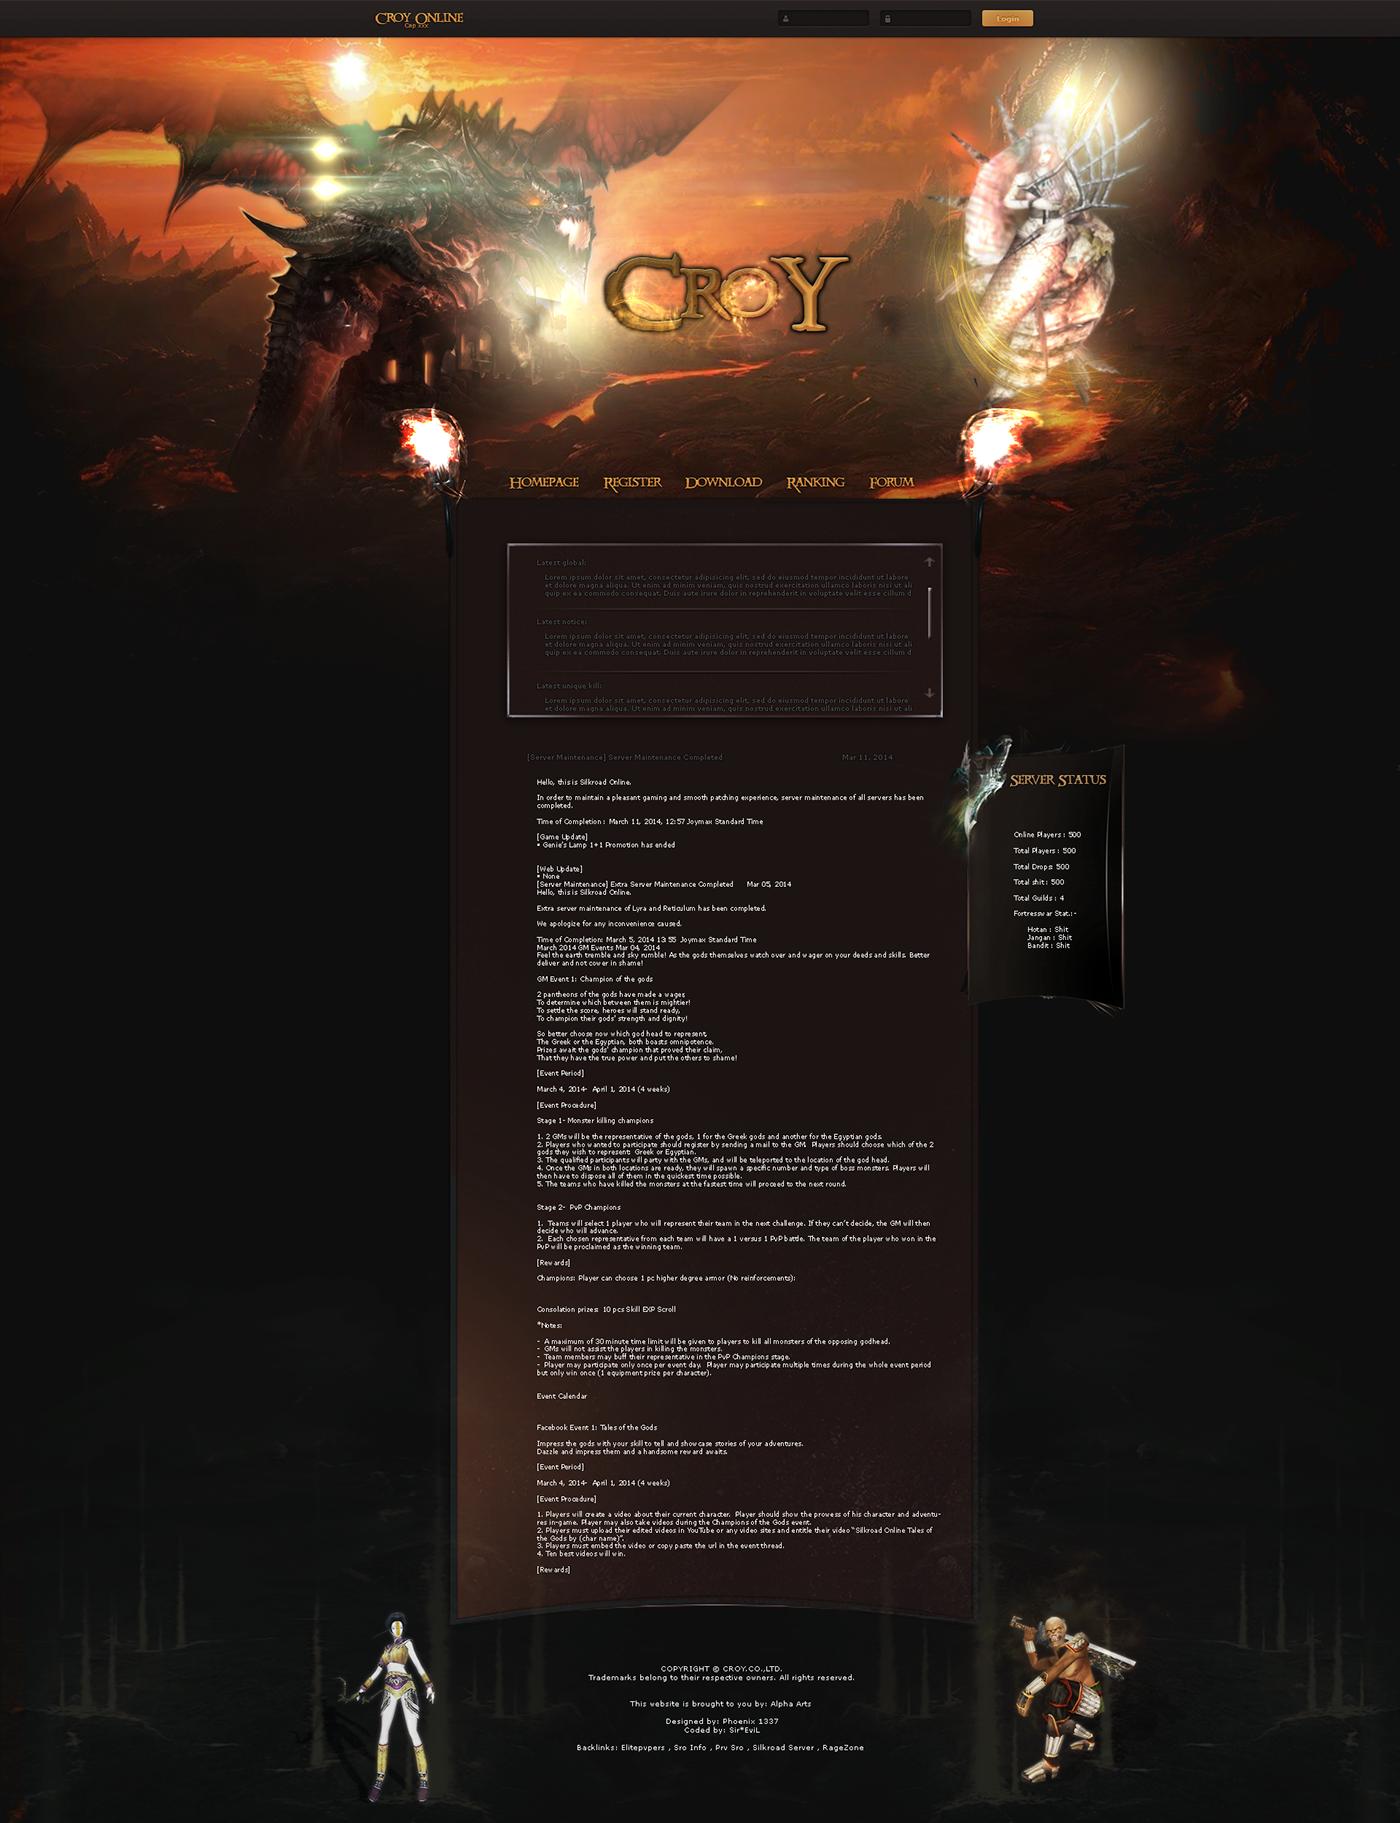 Croy Online [Web Design + Complete GUI] on Behance